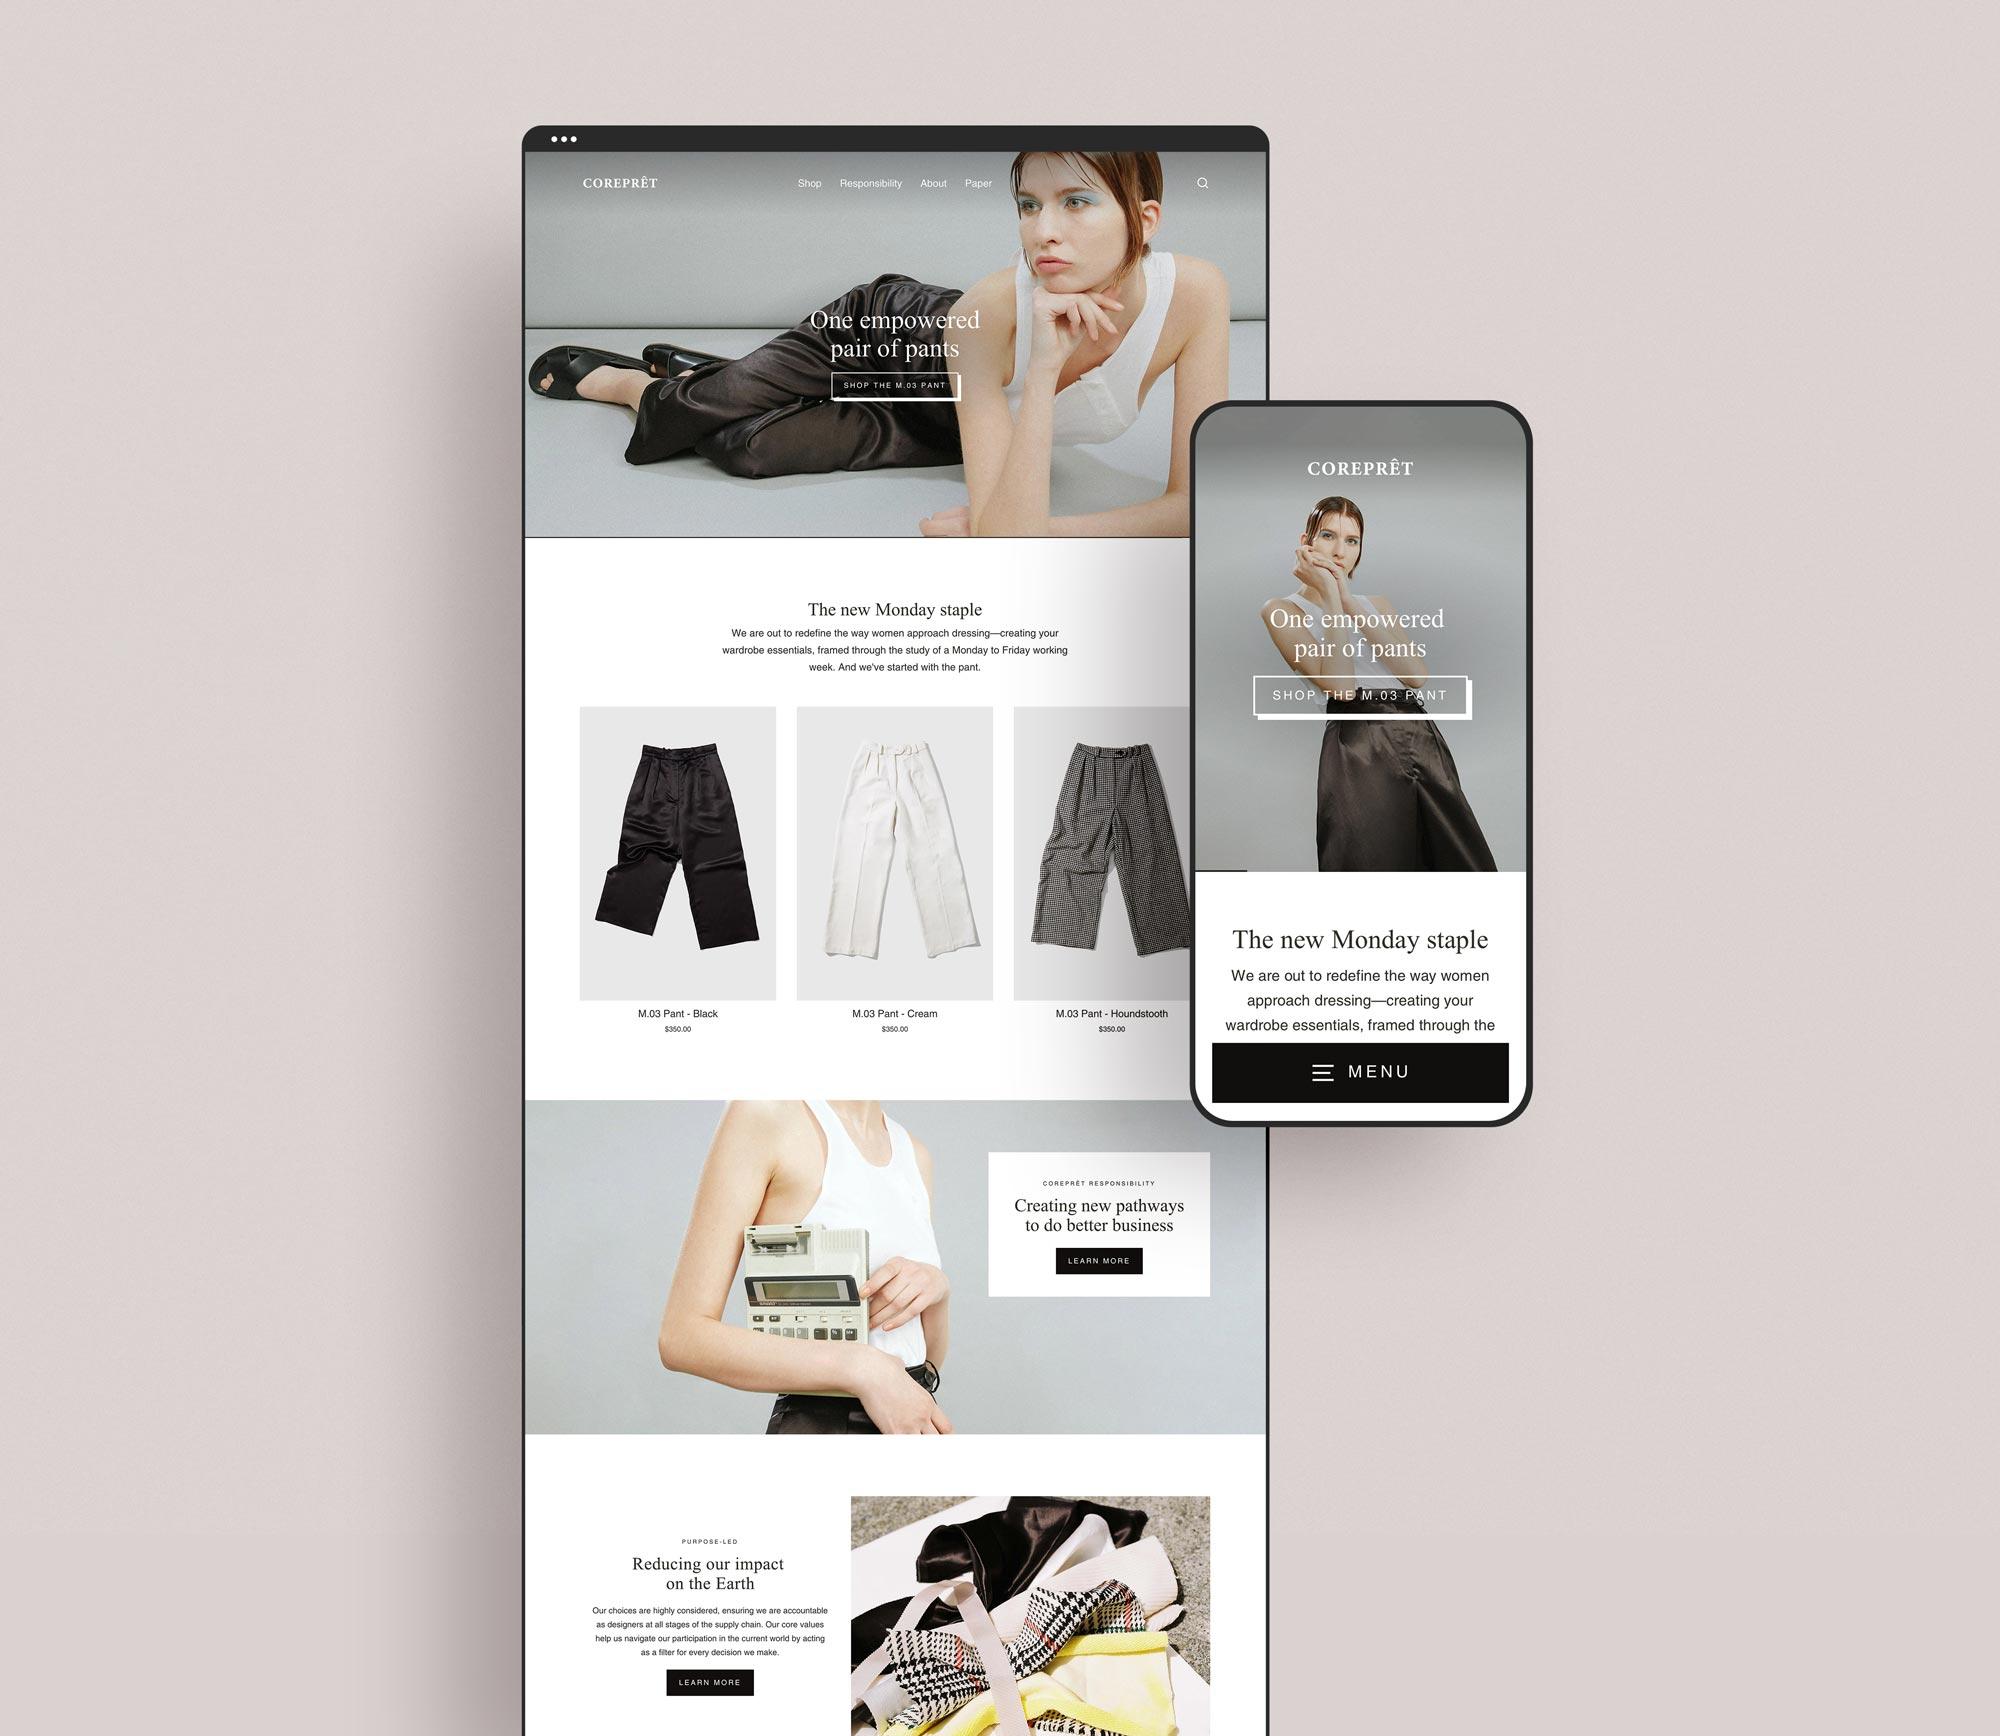 Responsive website design on Shopify for Melbourne fashion label Corepret